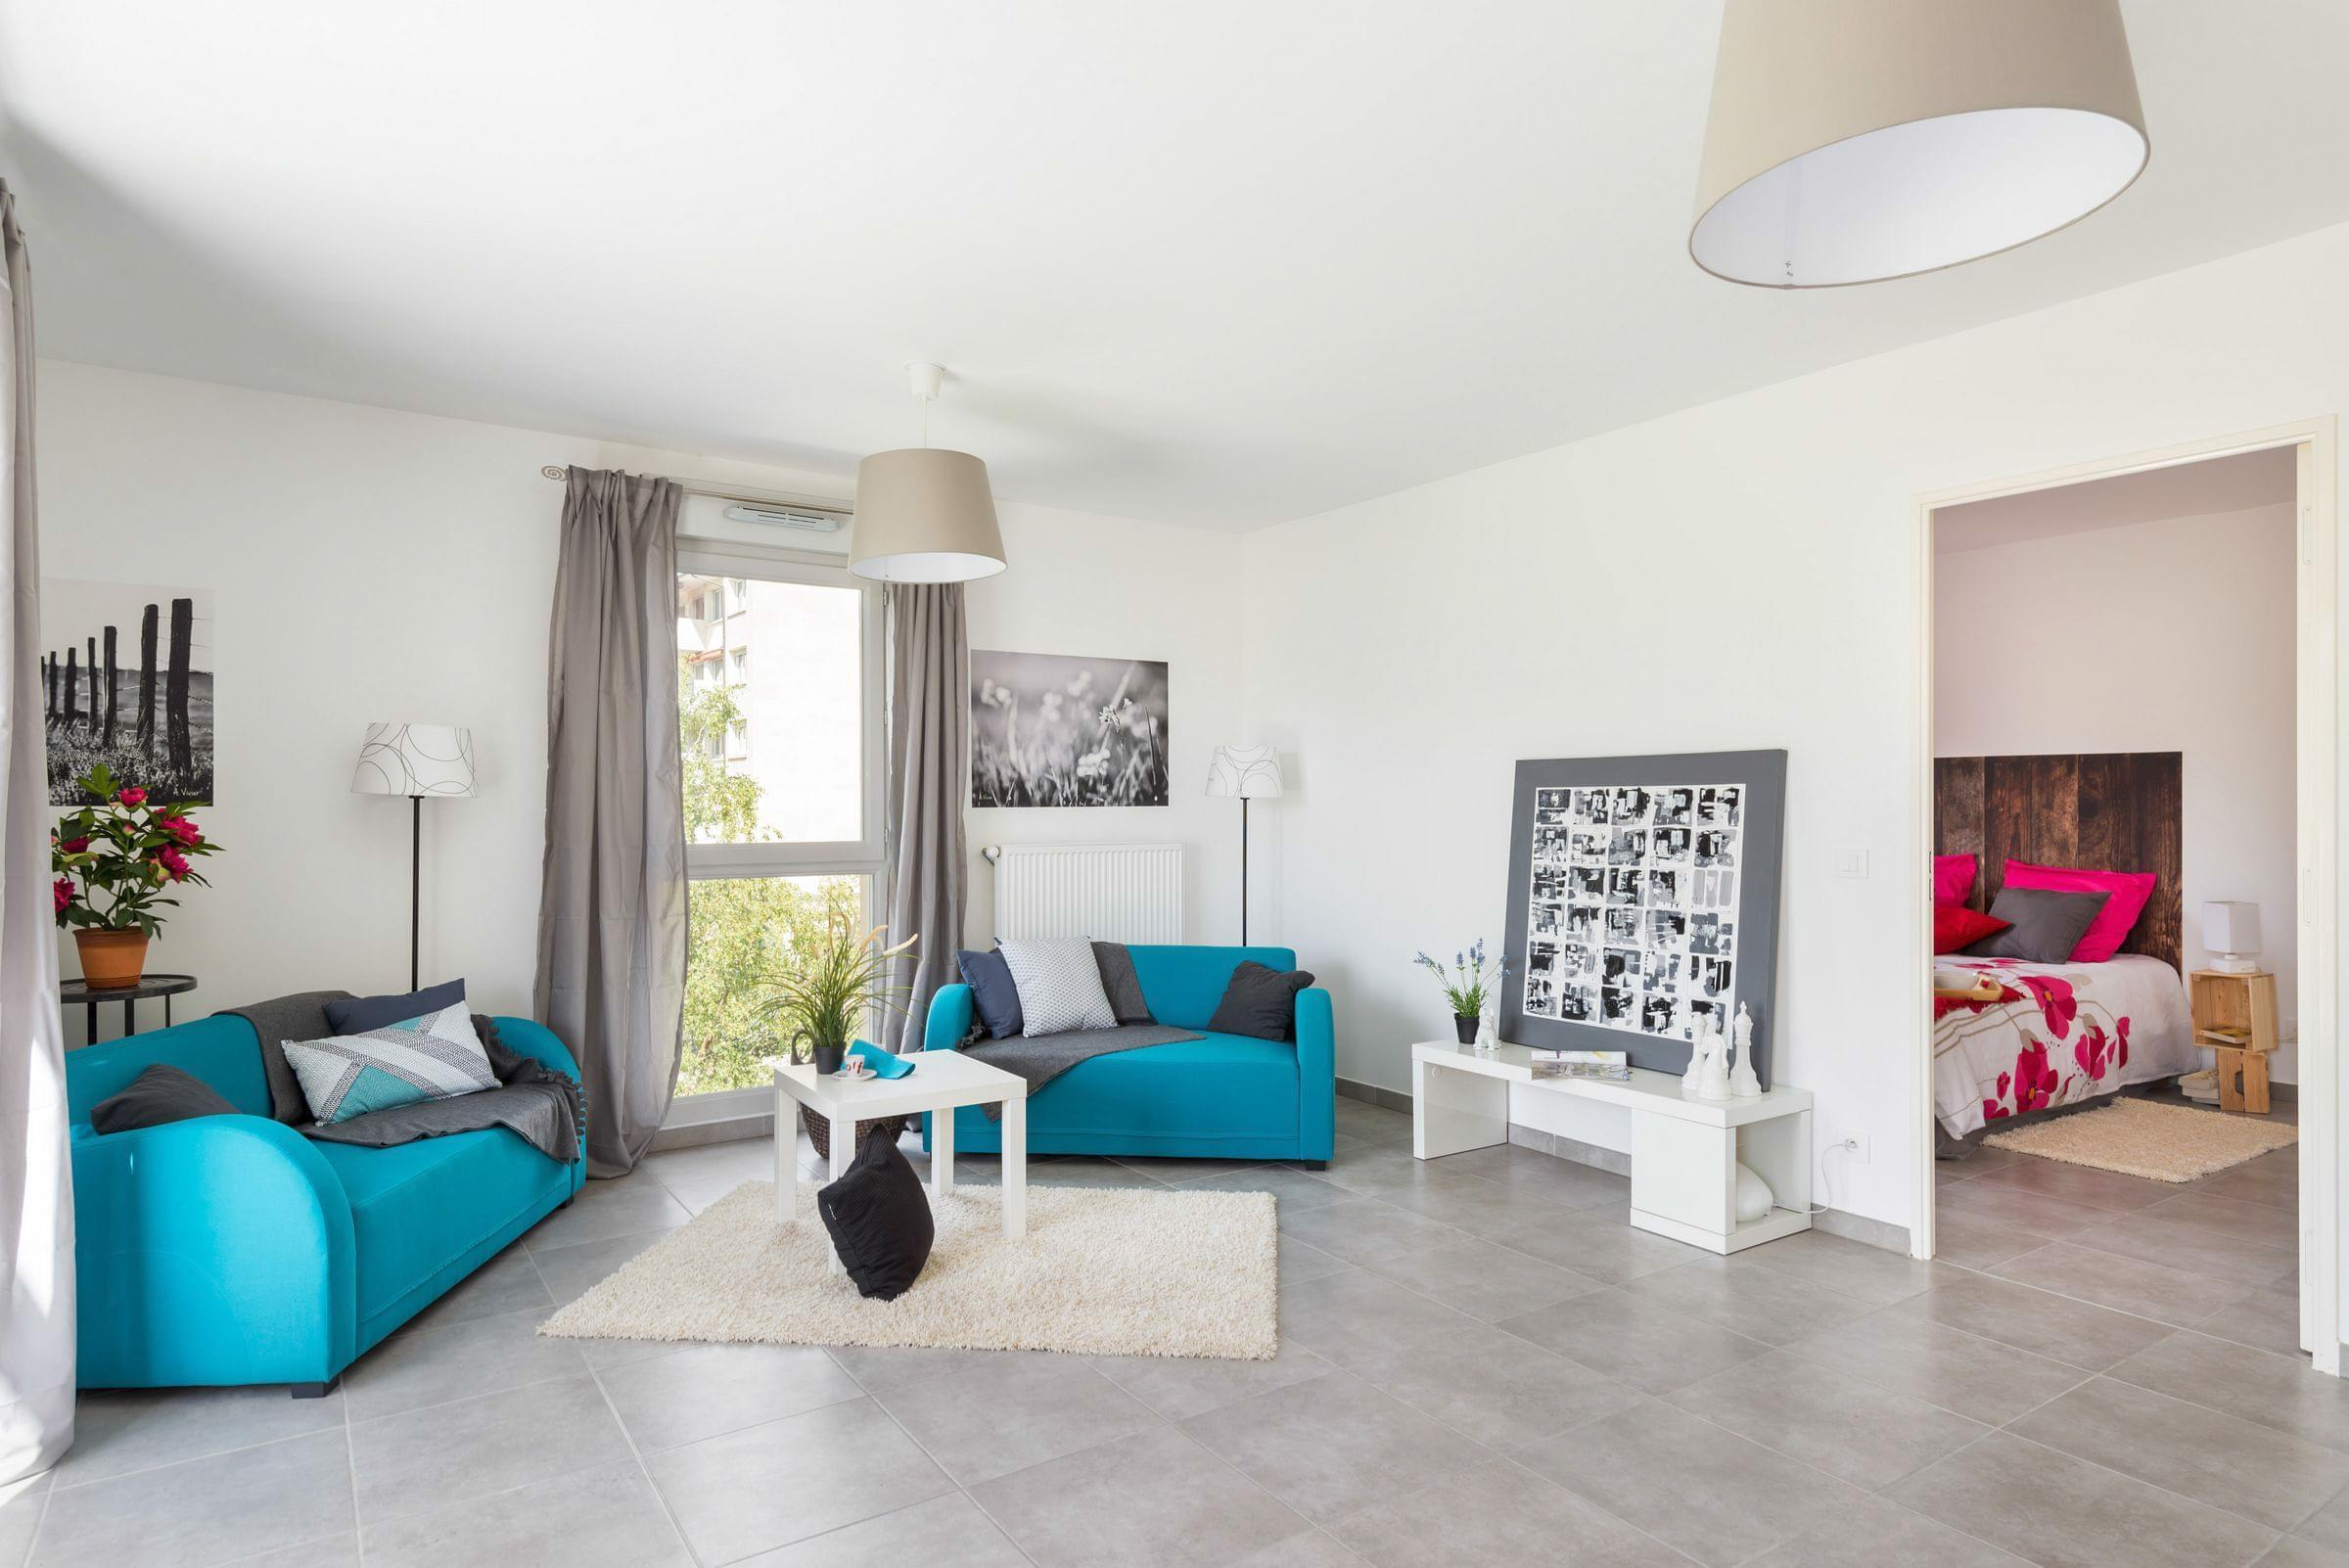 Dispo imm diate derniers appartements neufs t4 ecully for Appartements le jardin